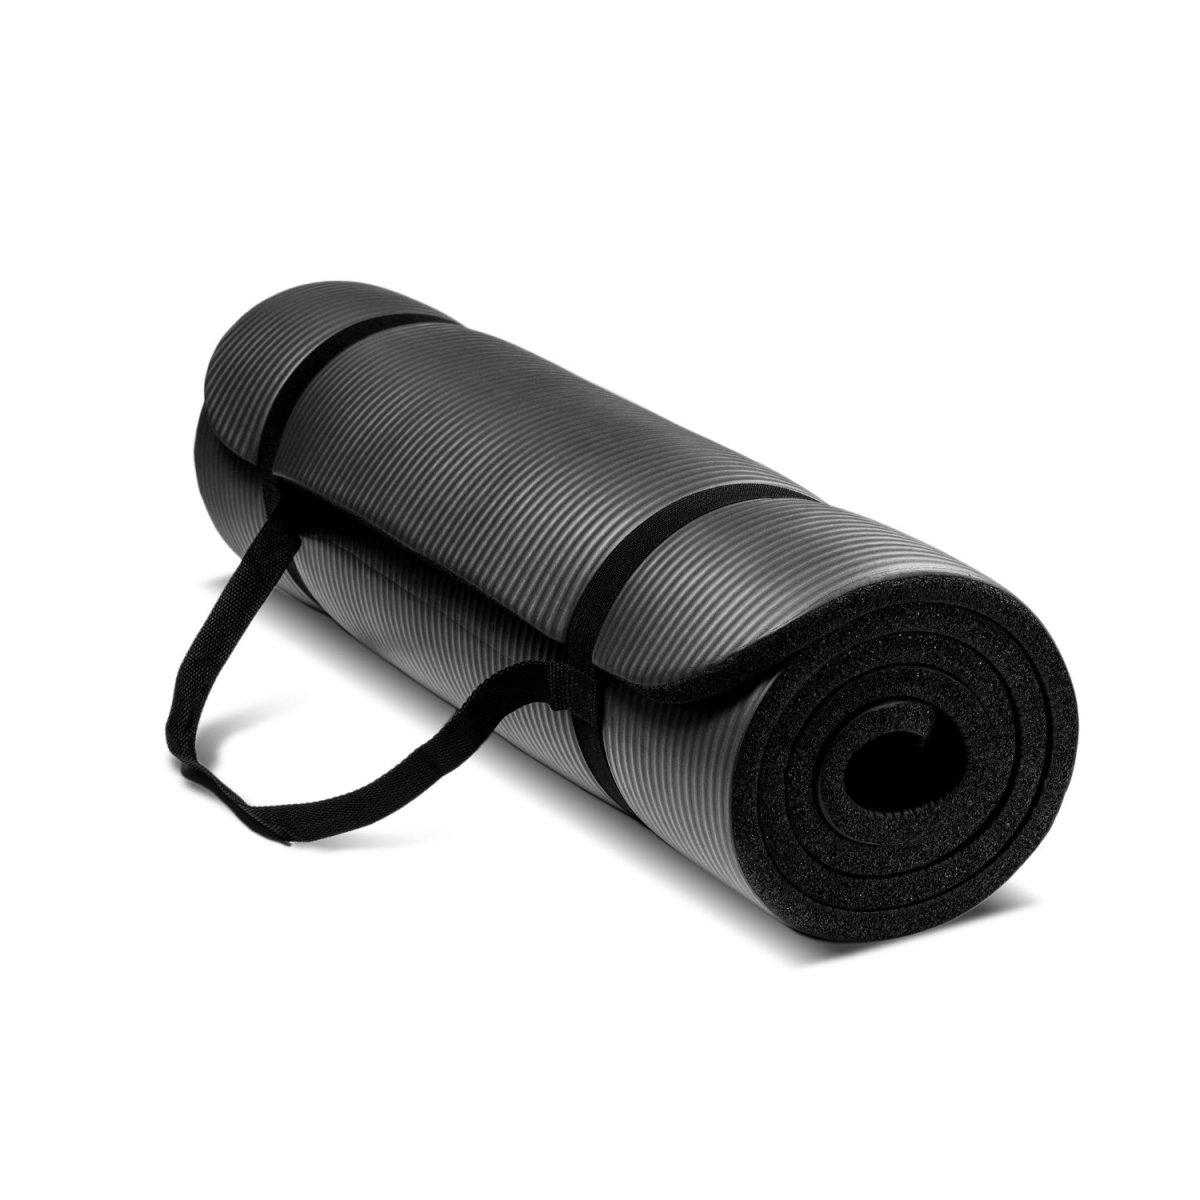 HemingWeigh Extra Thick Foam Exercise Mat